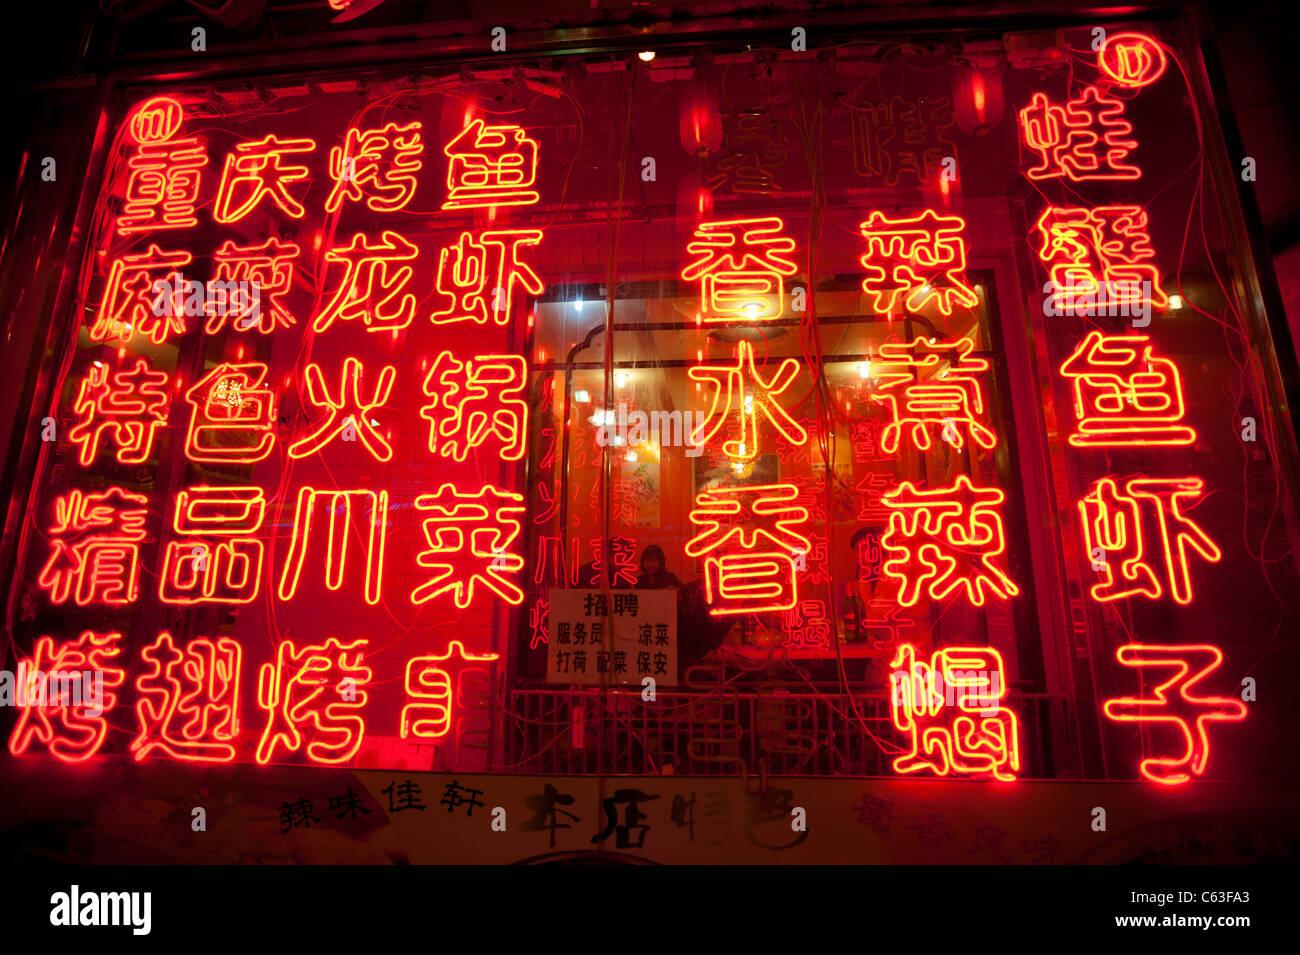 Muchas luces de neón rojas en la noche iluminando menú en un restaurante chino en Pekín, China Imagen De Stock